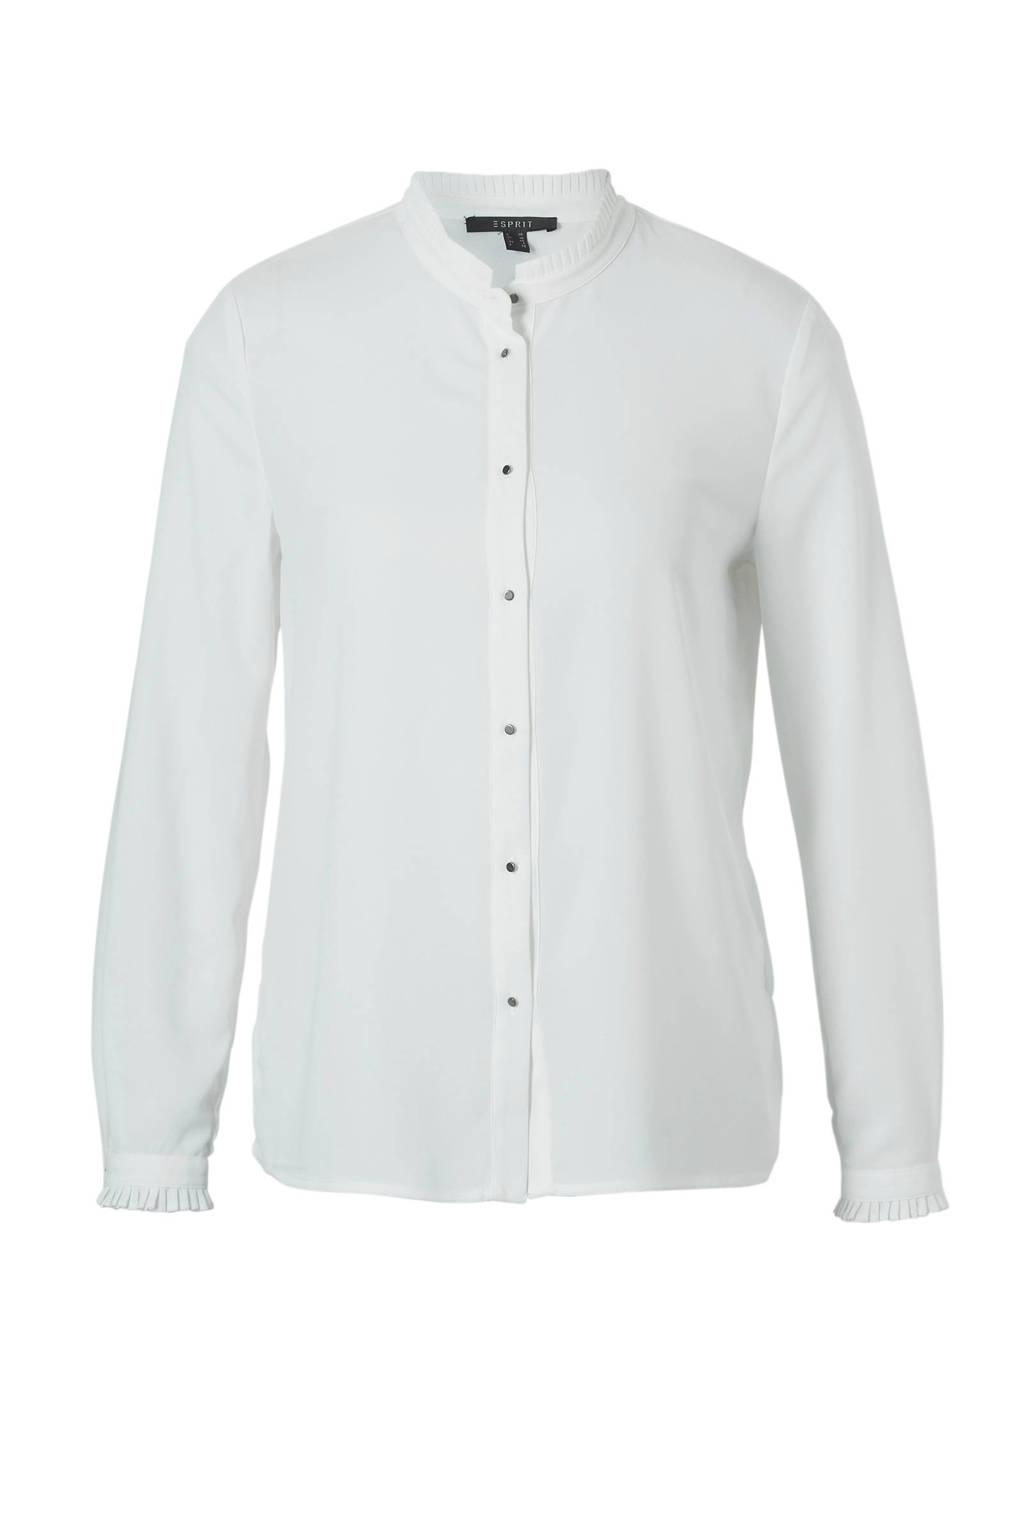 ESPRIT Women Collection blouse met ruches, Wit